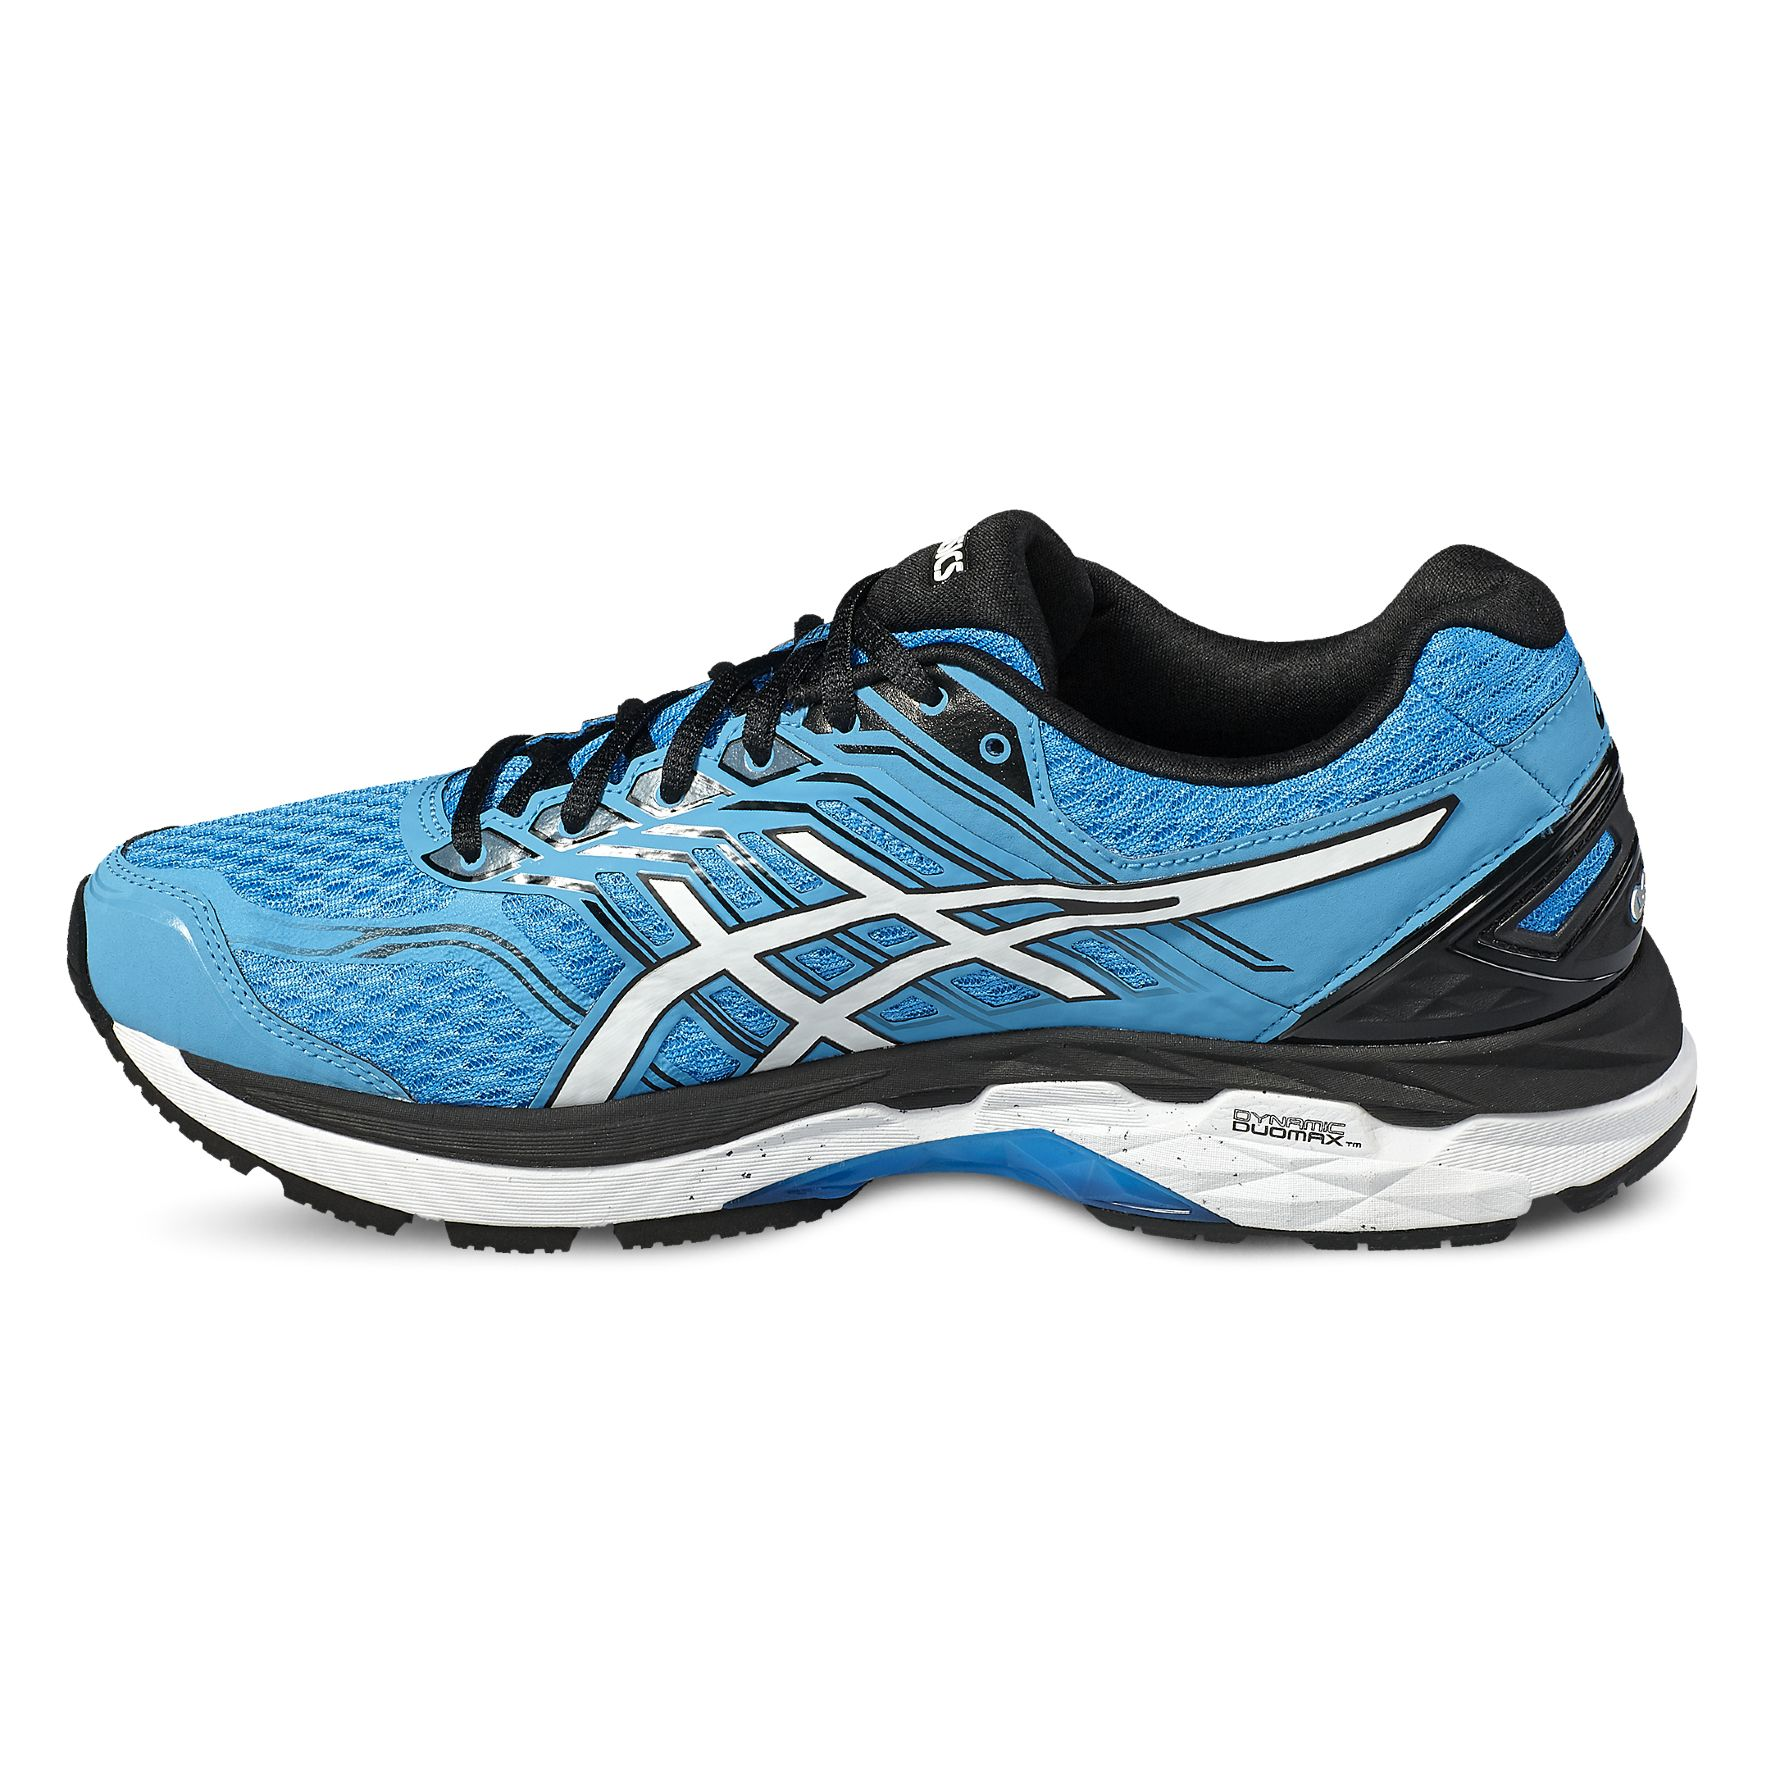 Mens Gt   Running Shoes